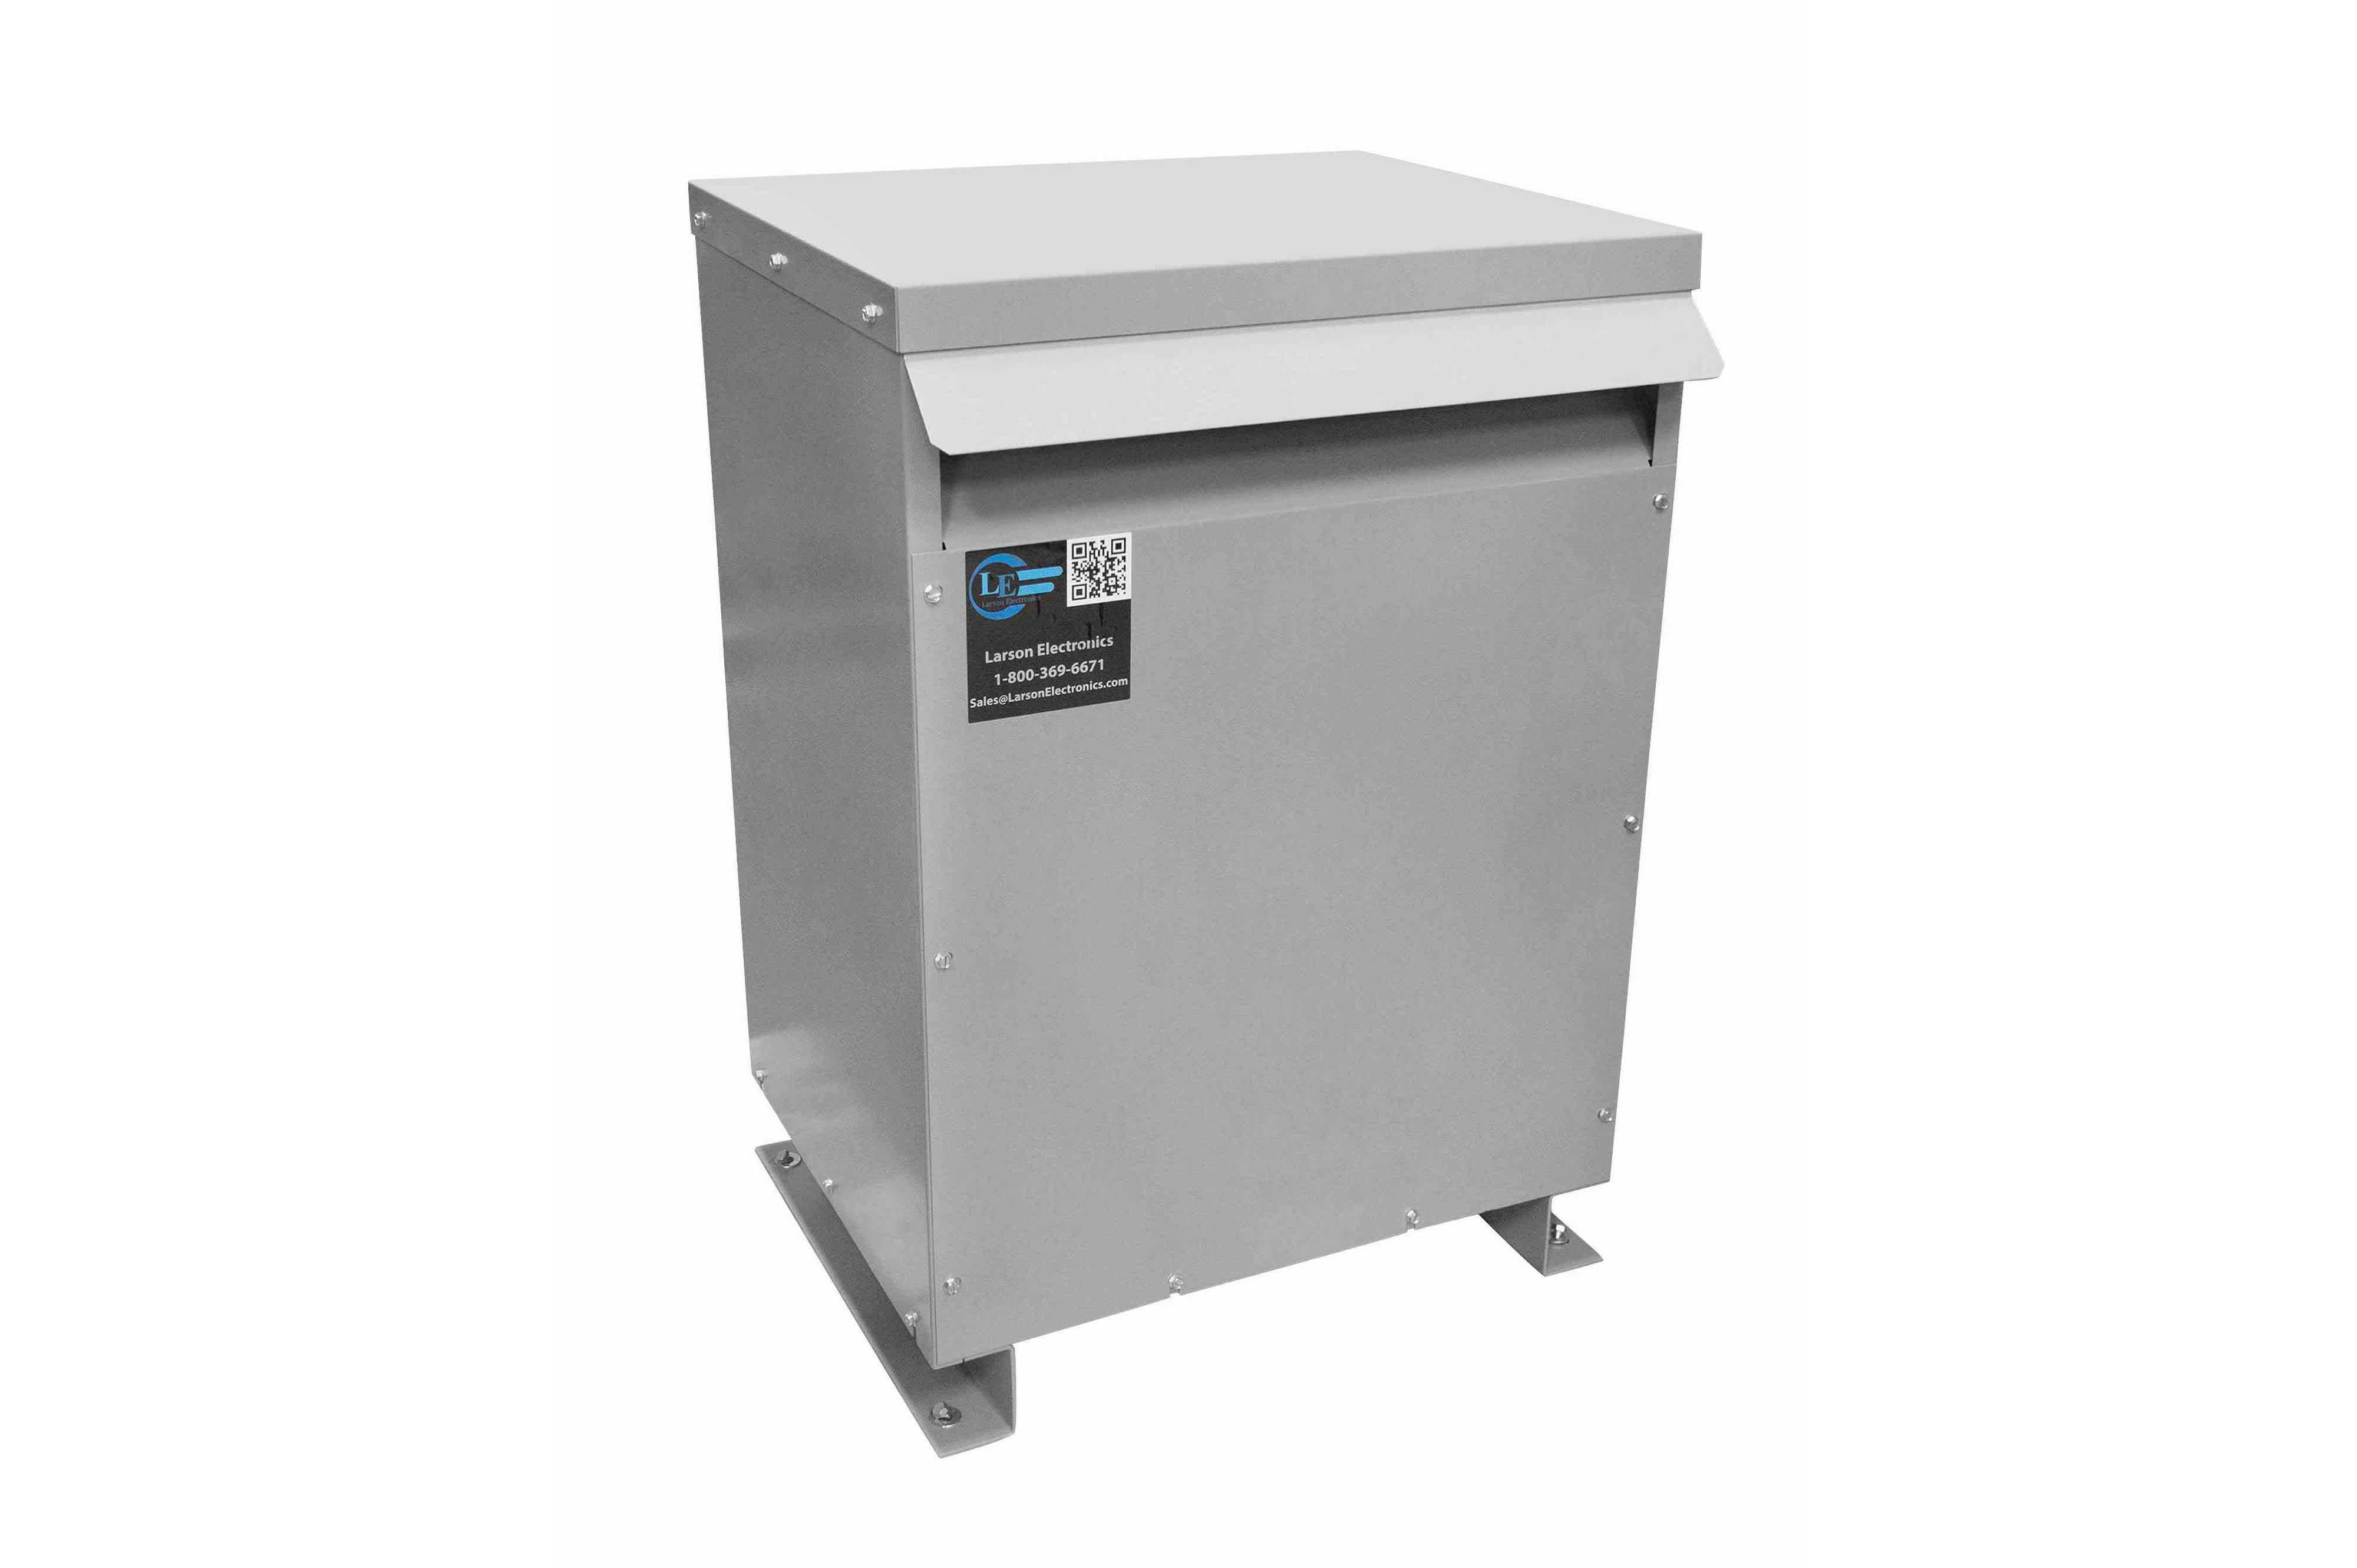 300 kVA 3PH Isolation Transformer, 400V Wye Primary, 600Y/347 Wye-N Secondary, N3R, Ventilated, 60 Hz